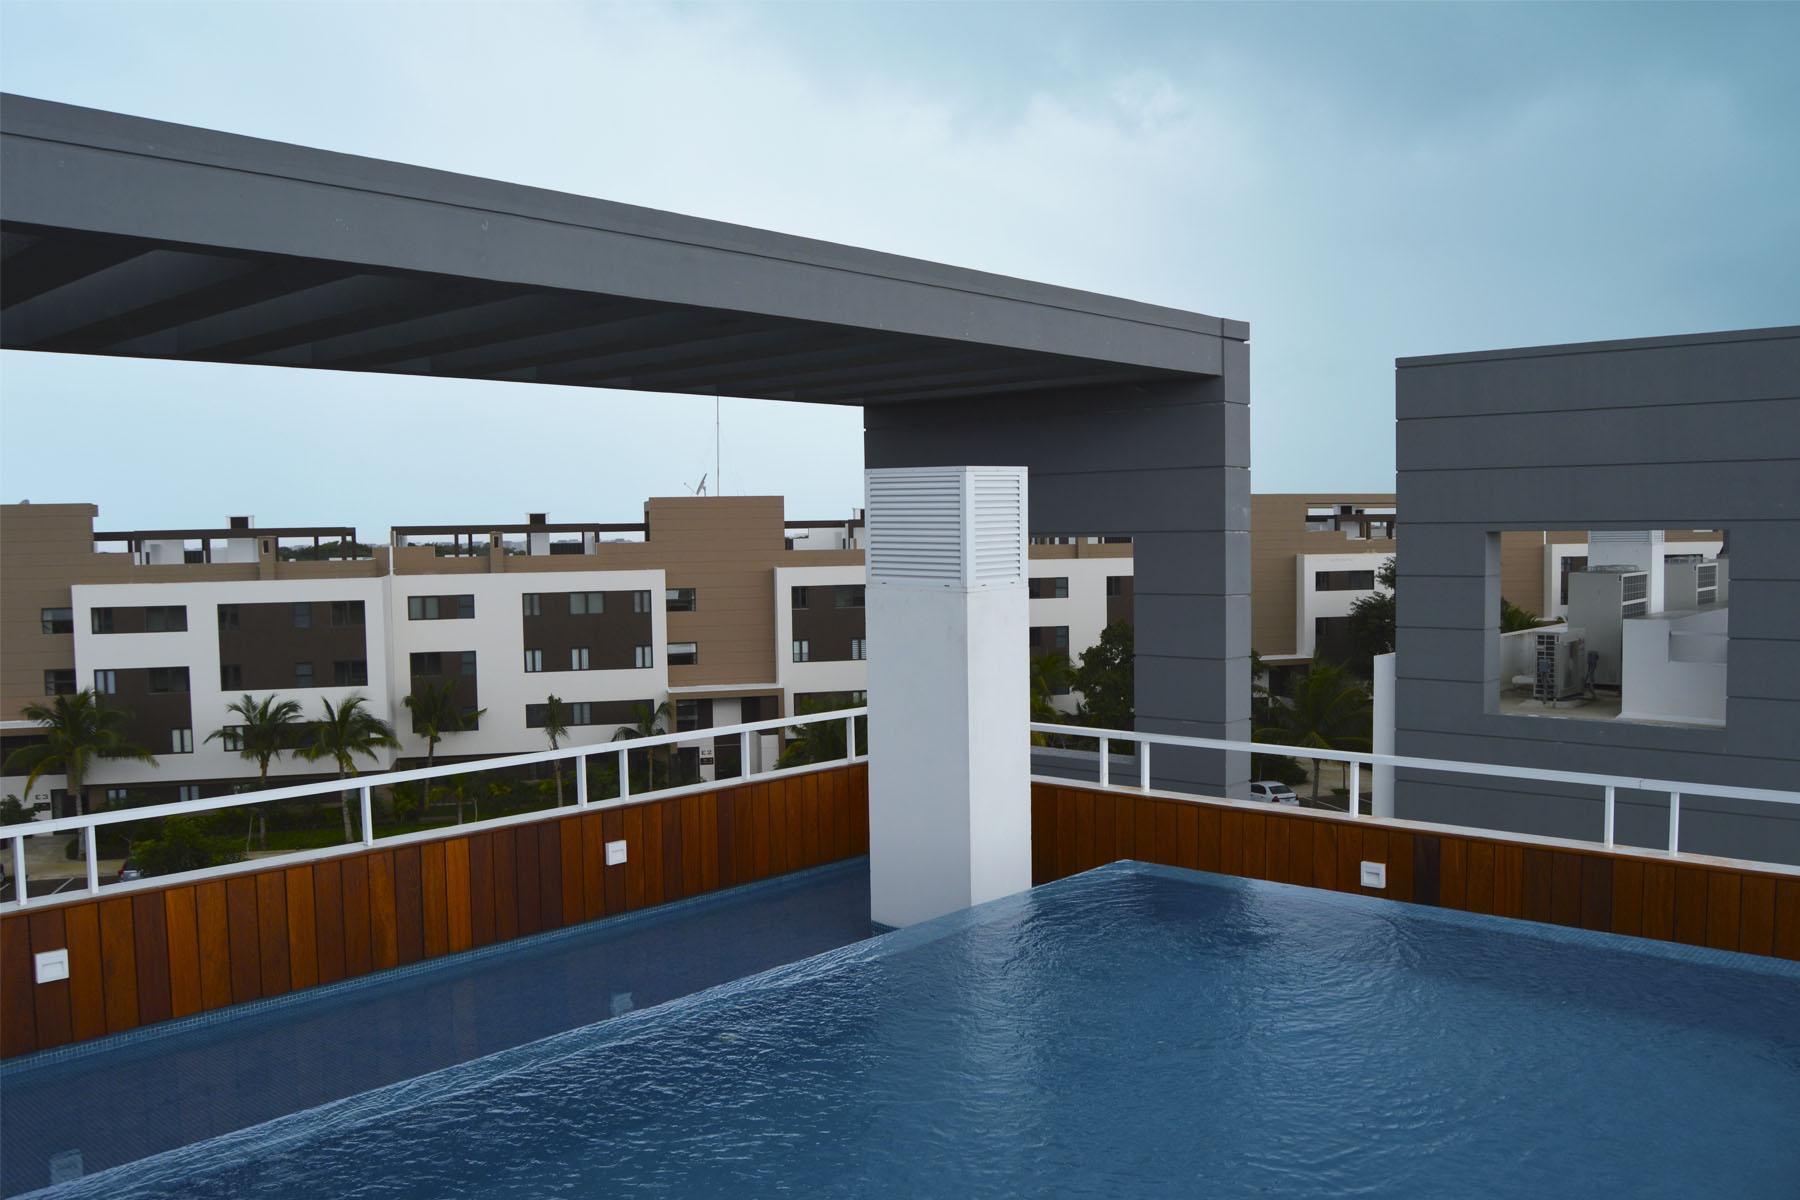 Additional photo for property listing at WHITE DIAMOND LUXURY CONDO Nick Price Lote 79, Mza 21, Region 04 Playa Del Carmen, Quintana Roo 77710 Mexico